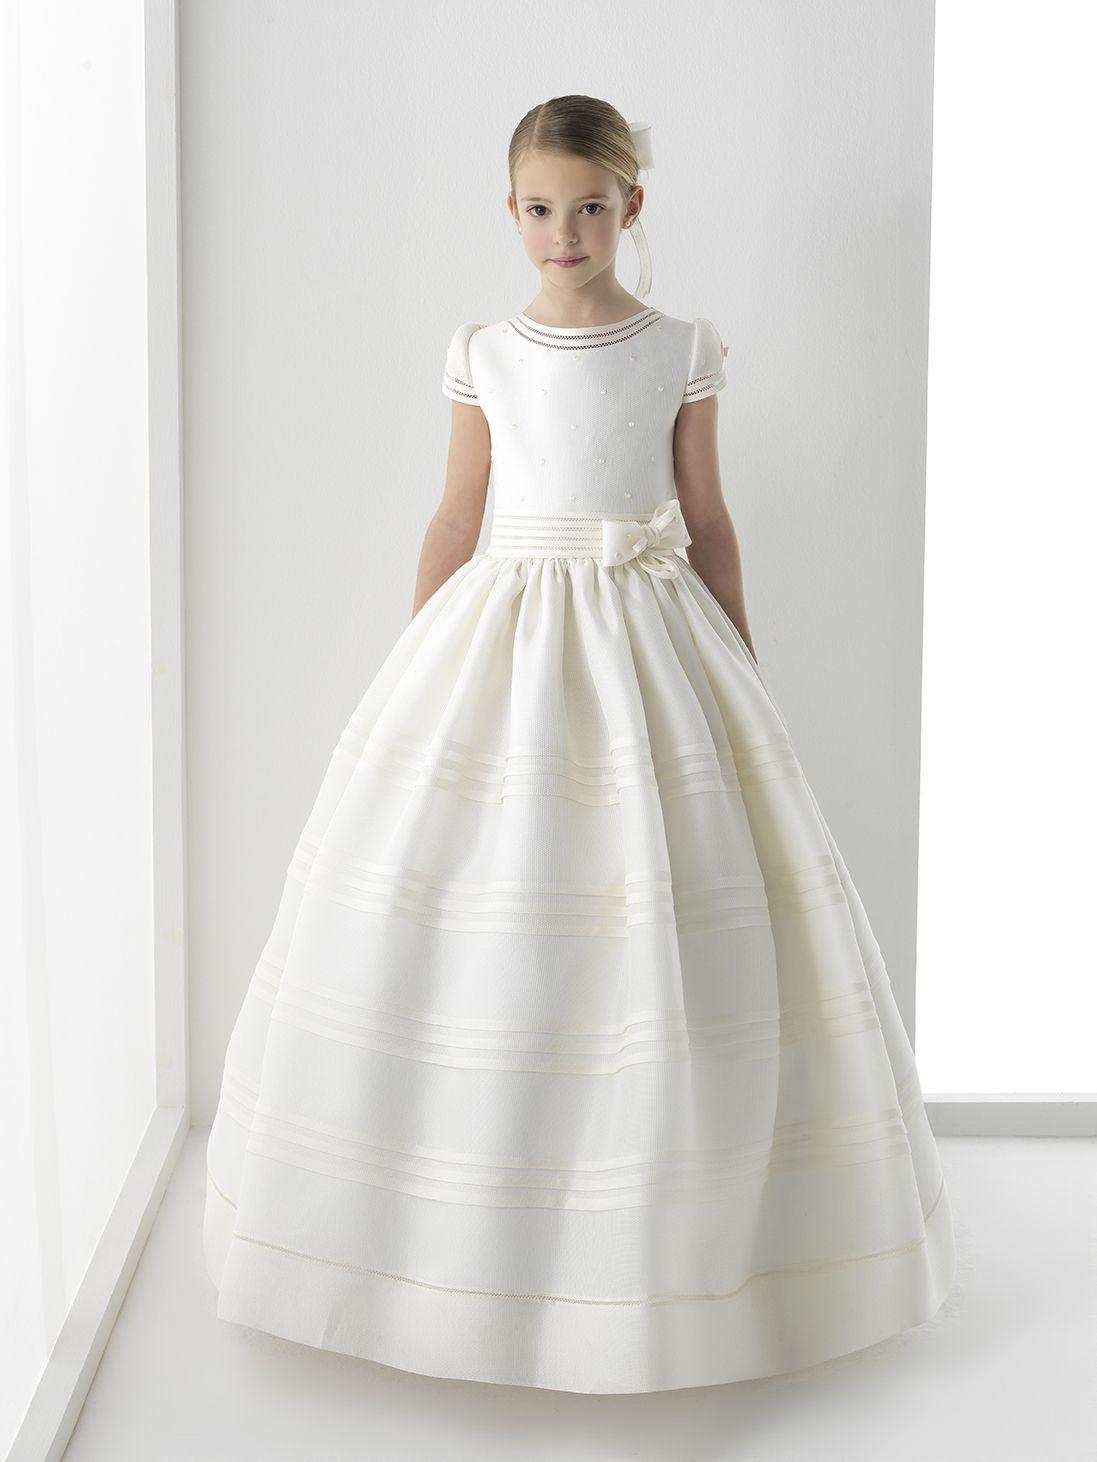 Nectarean ball gown short sleeve bows floorlength satin communion